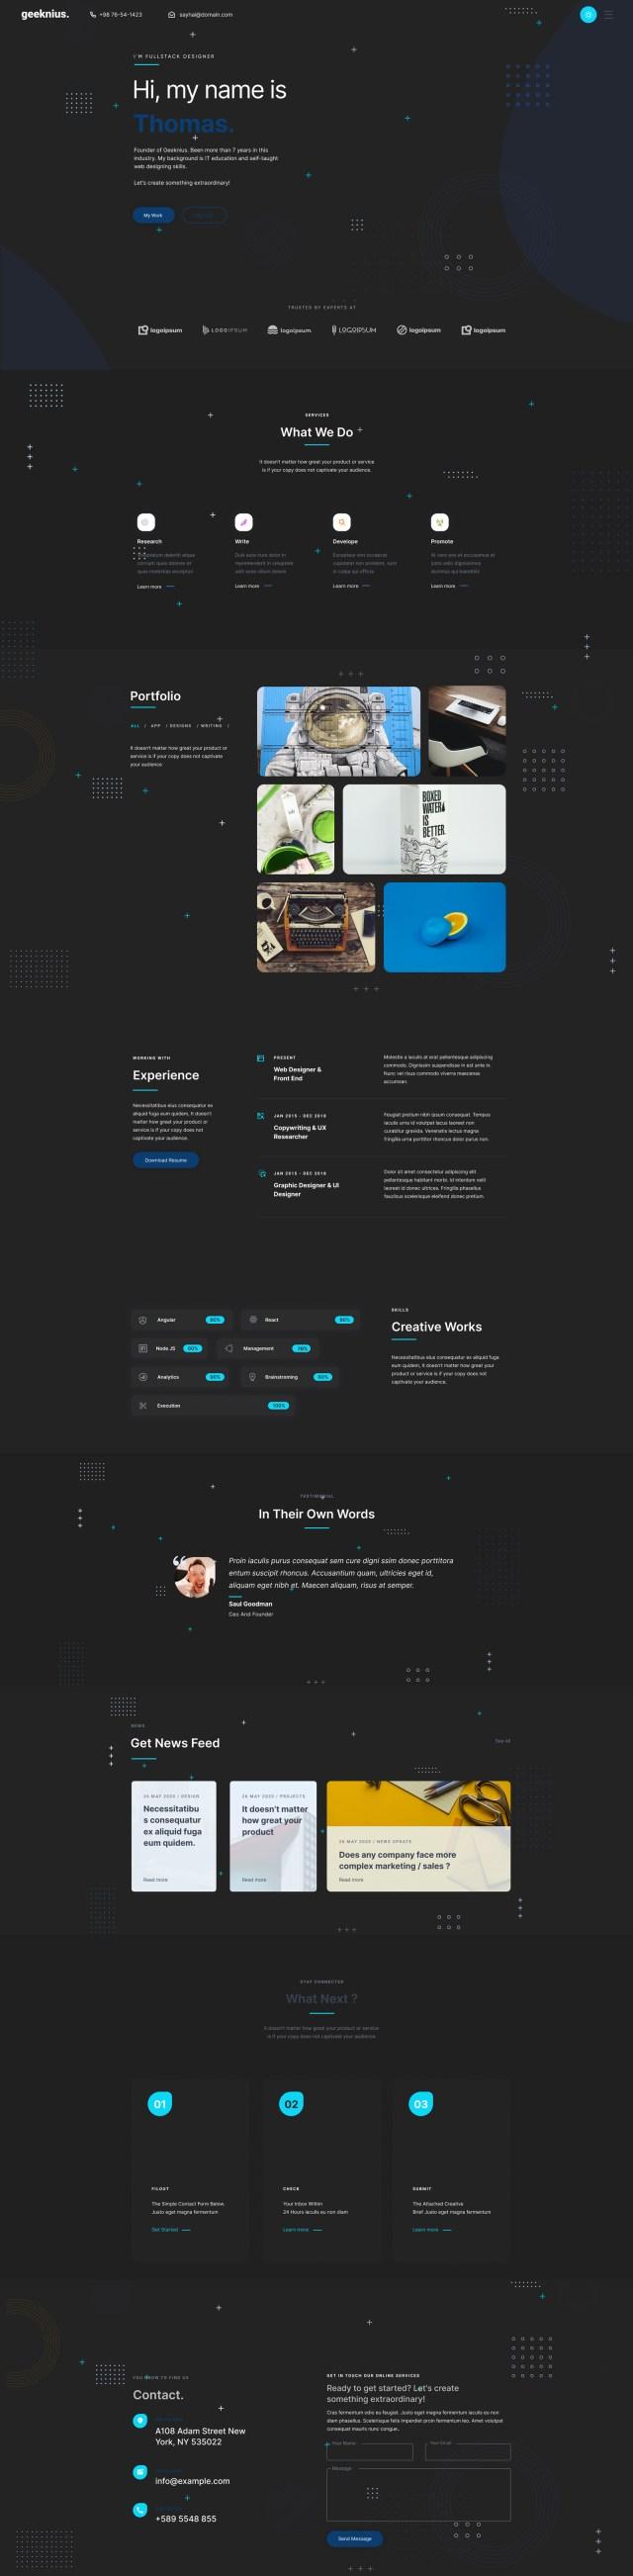 Geeknius — Creative Resume Website Template for Figma - Dark